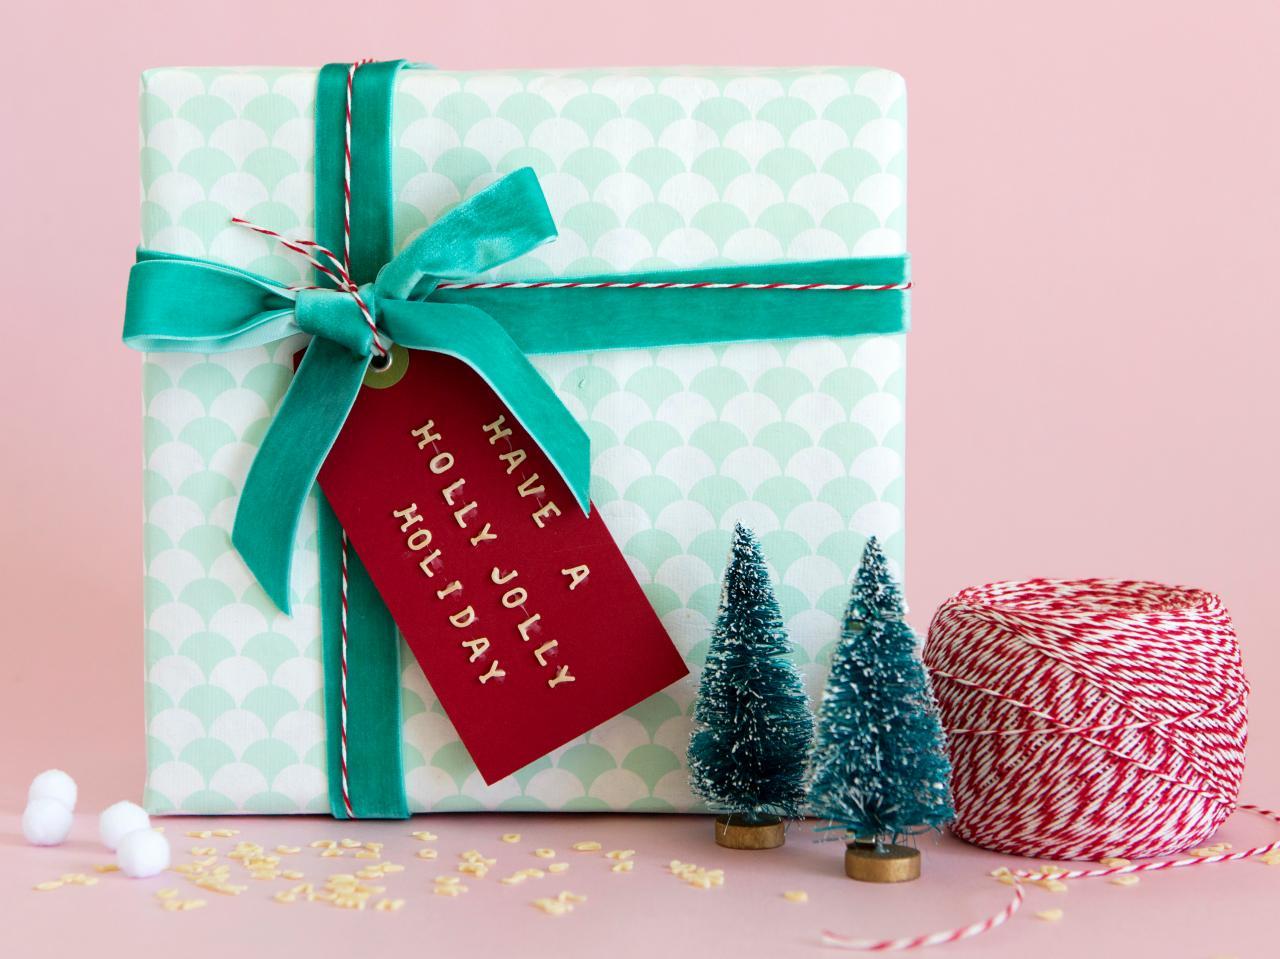 Blue apron gift - Wrap It Instead